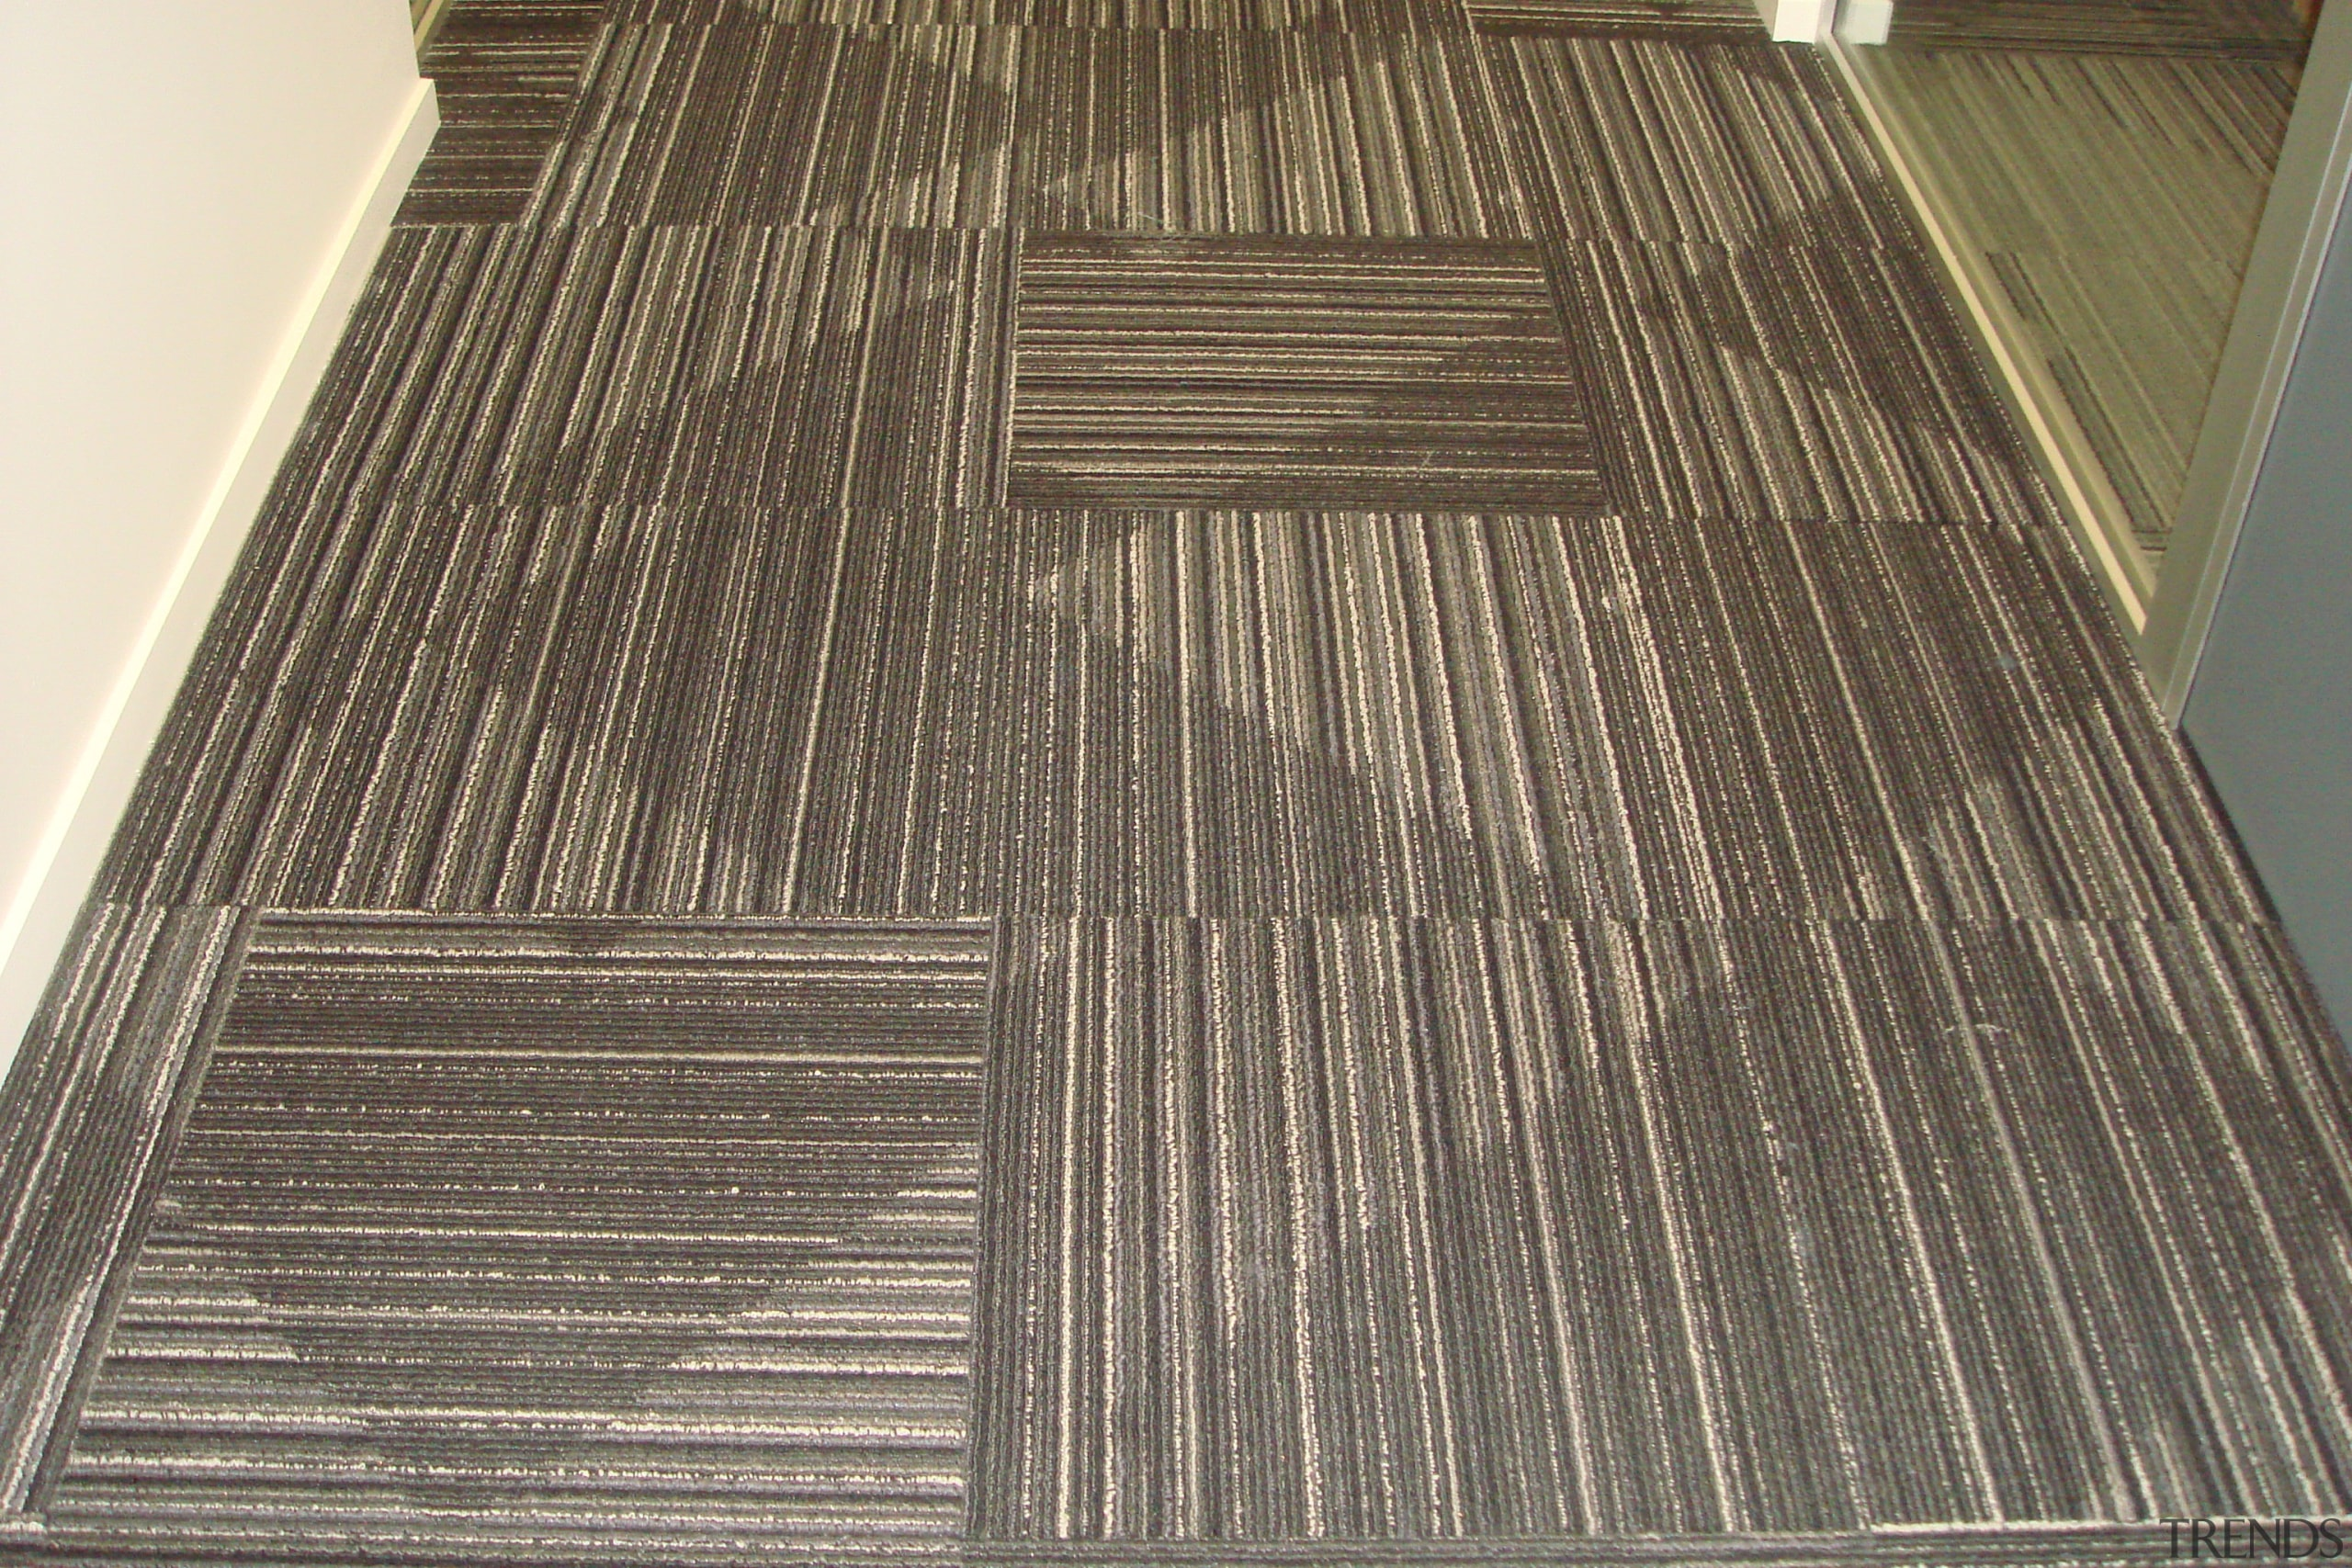 Durable, good-looking carpet tiles for commercial use daylighting, floor, flooring, hardwood, laminate flooring, line, wood, wood flooring, wood stain, gray, brown